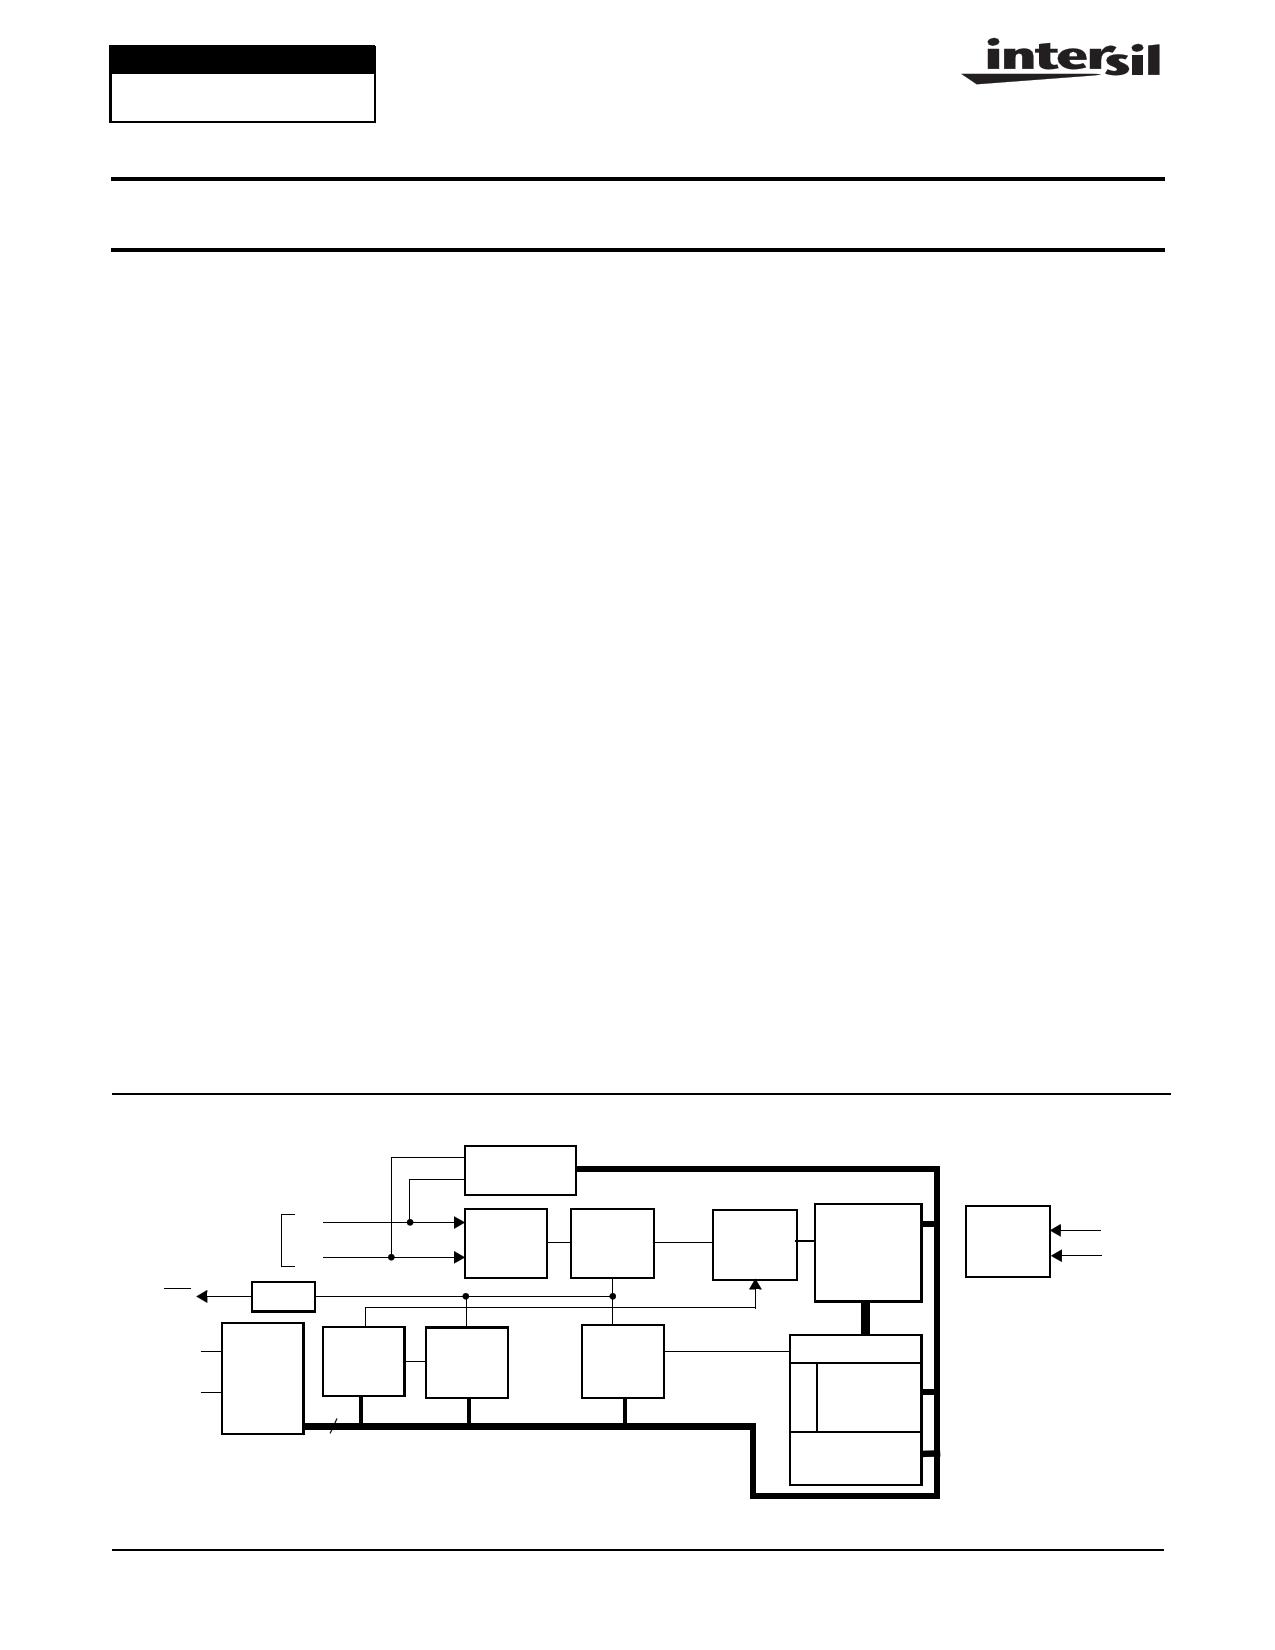 X1286 datasheet